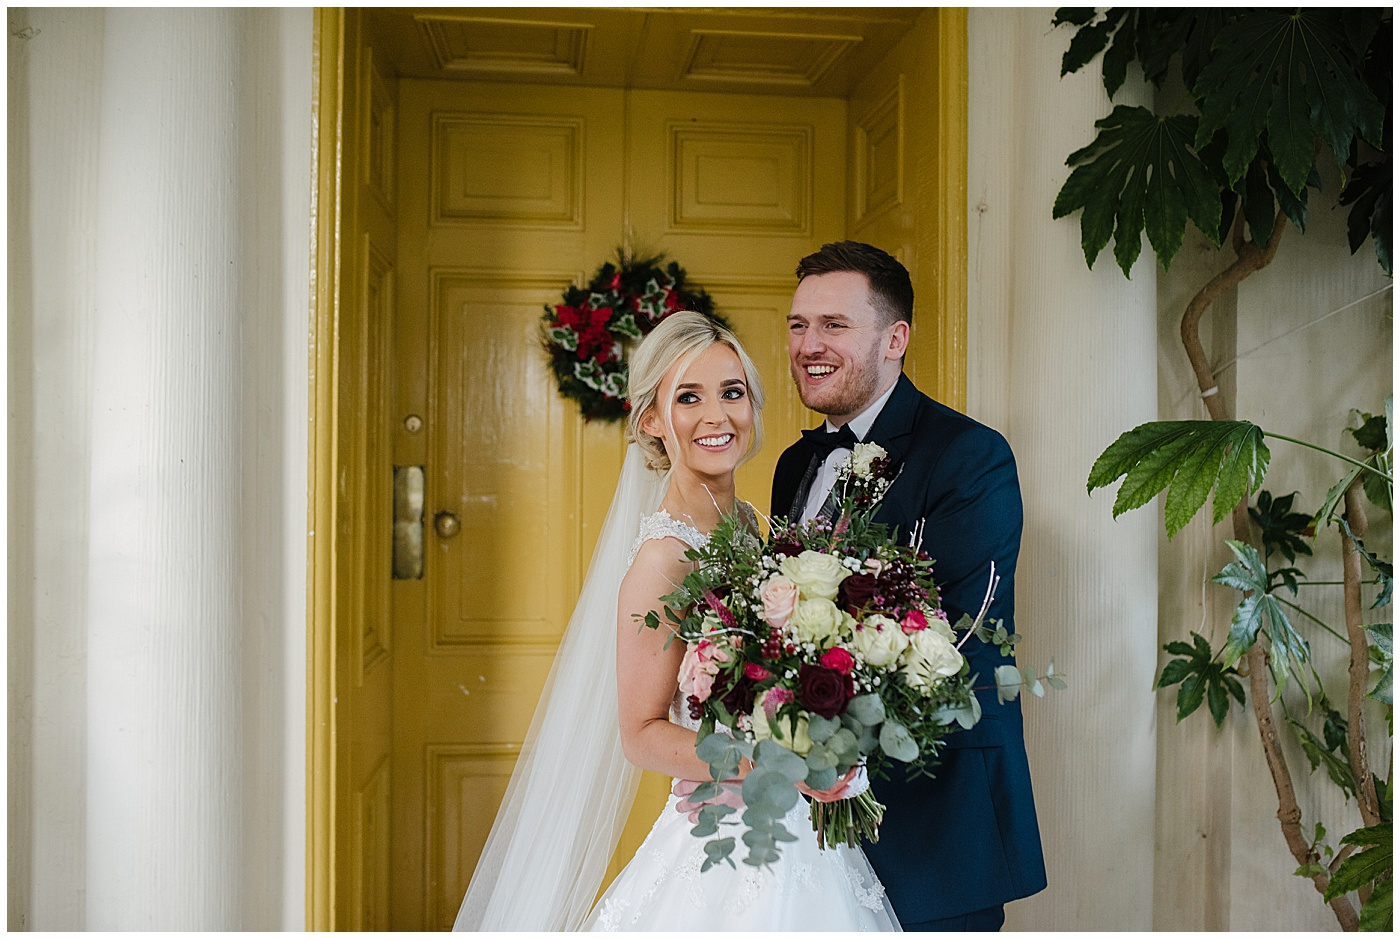 lissan-house-wedding-jude-browne-photography_0072.jpg